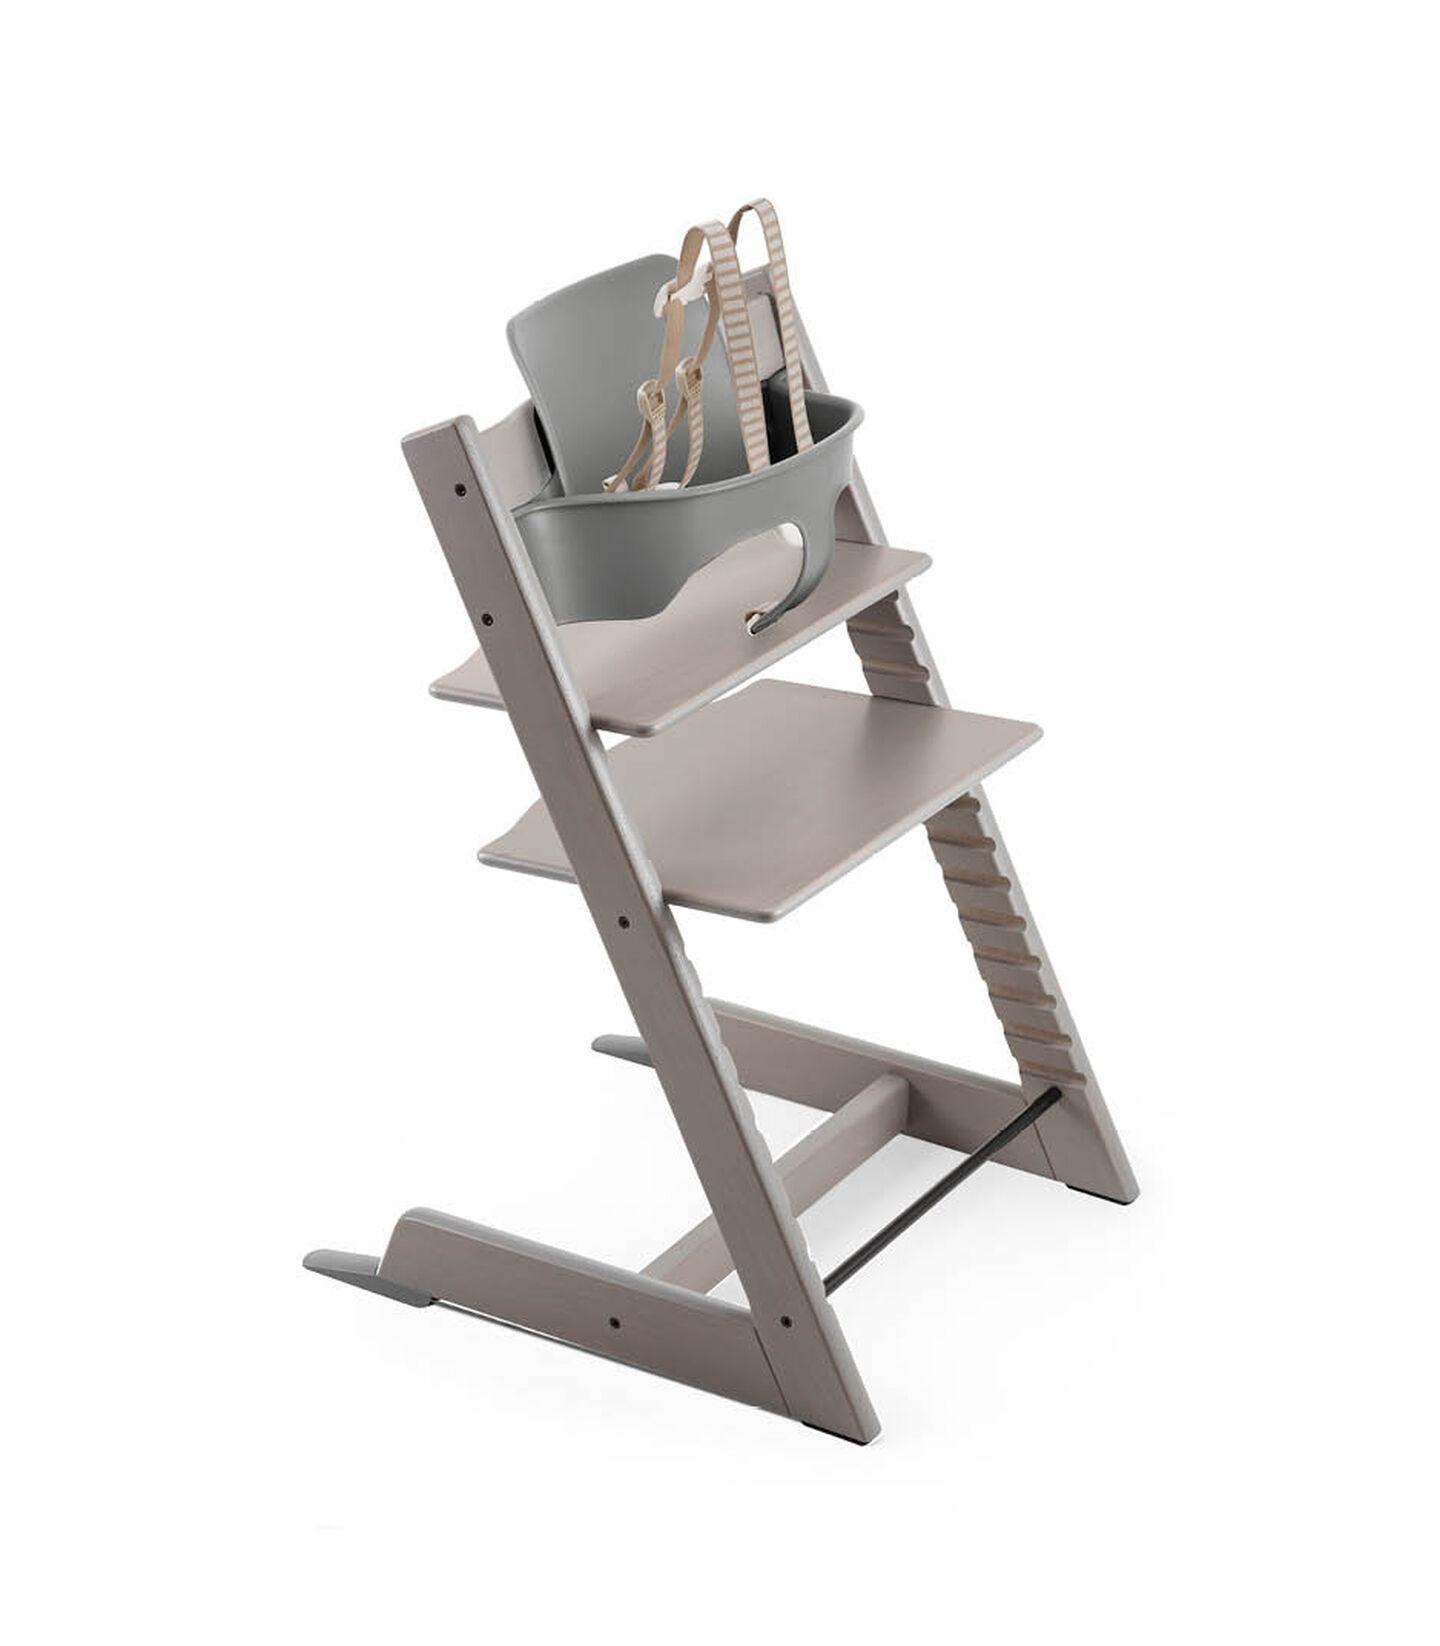 Tripp Trapp® Bundle High Chair US 18 Oak Greywash, Oak Greywash, mainview view 2